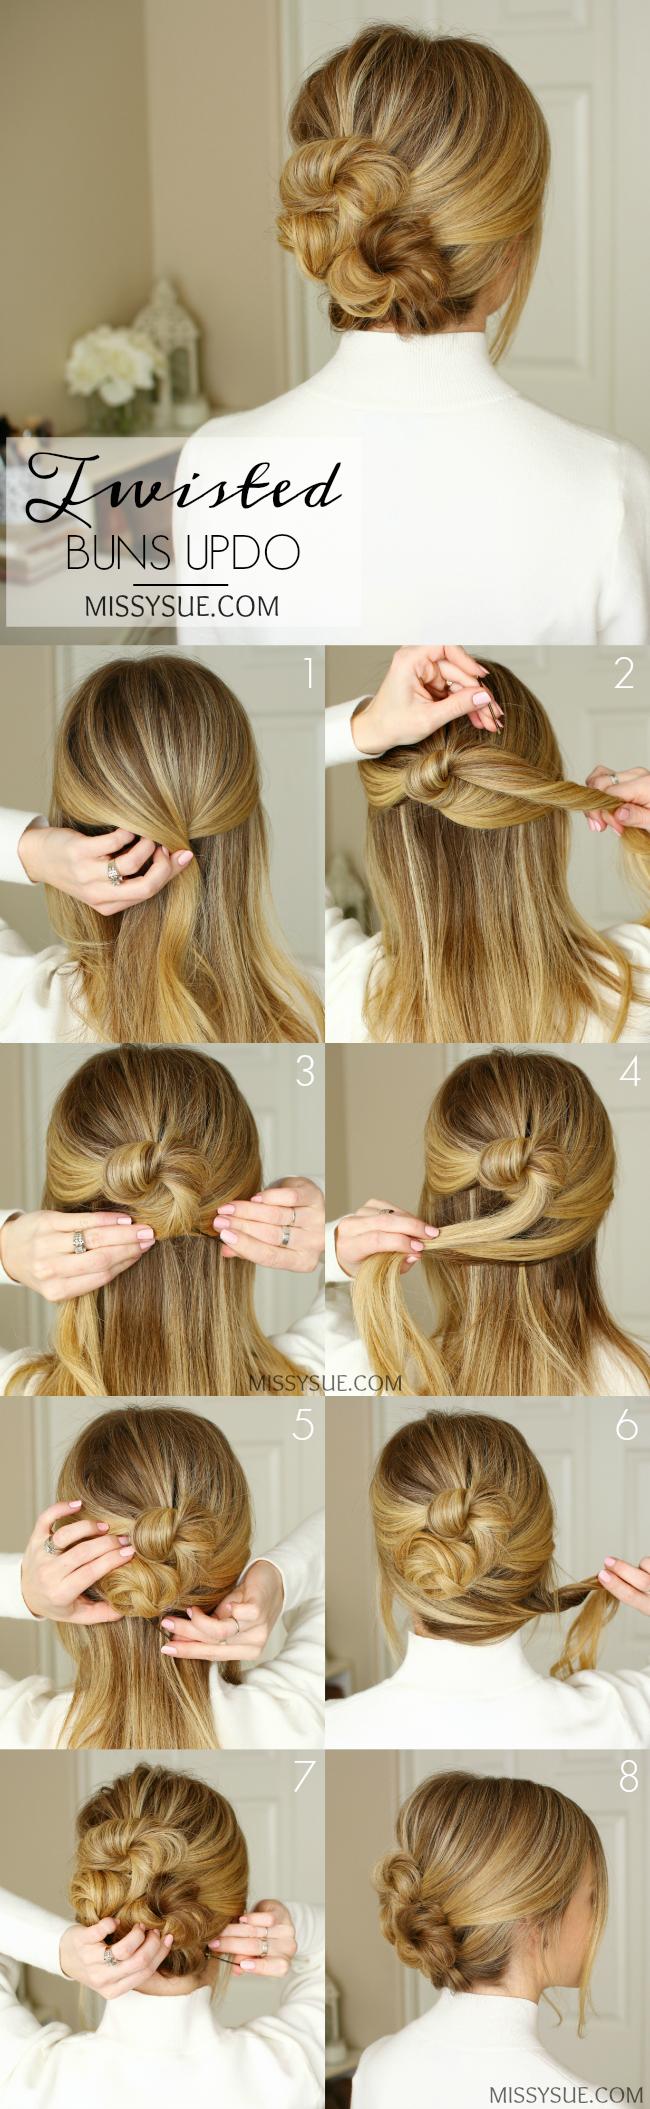 Search For Half Up 10 54 Missy Sue Hair Styles Twist Bun Hair Tutorial